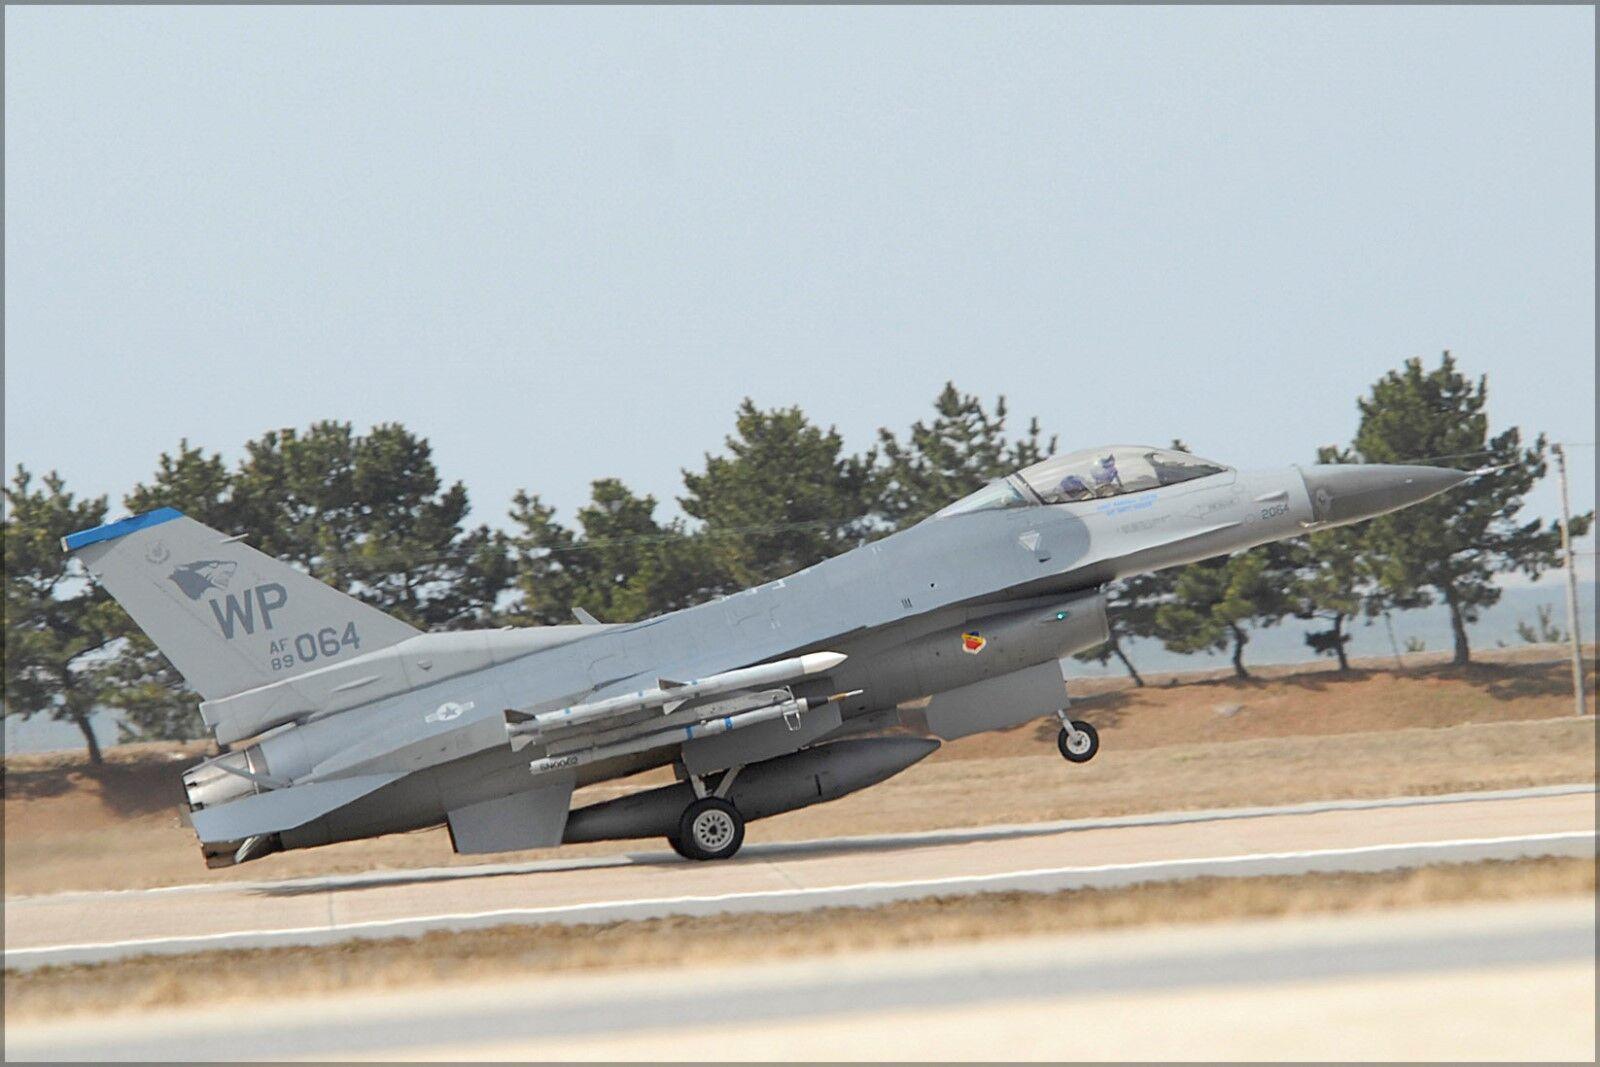 Plakat, Viele Größen ; 35. Fighter Squadron General Dynamics F 16c Block